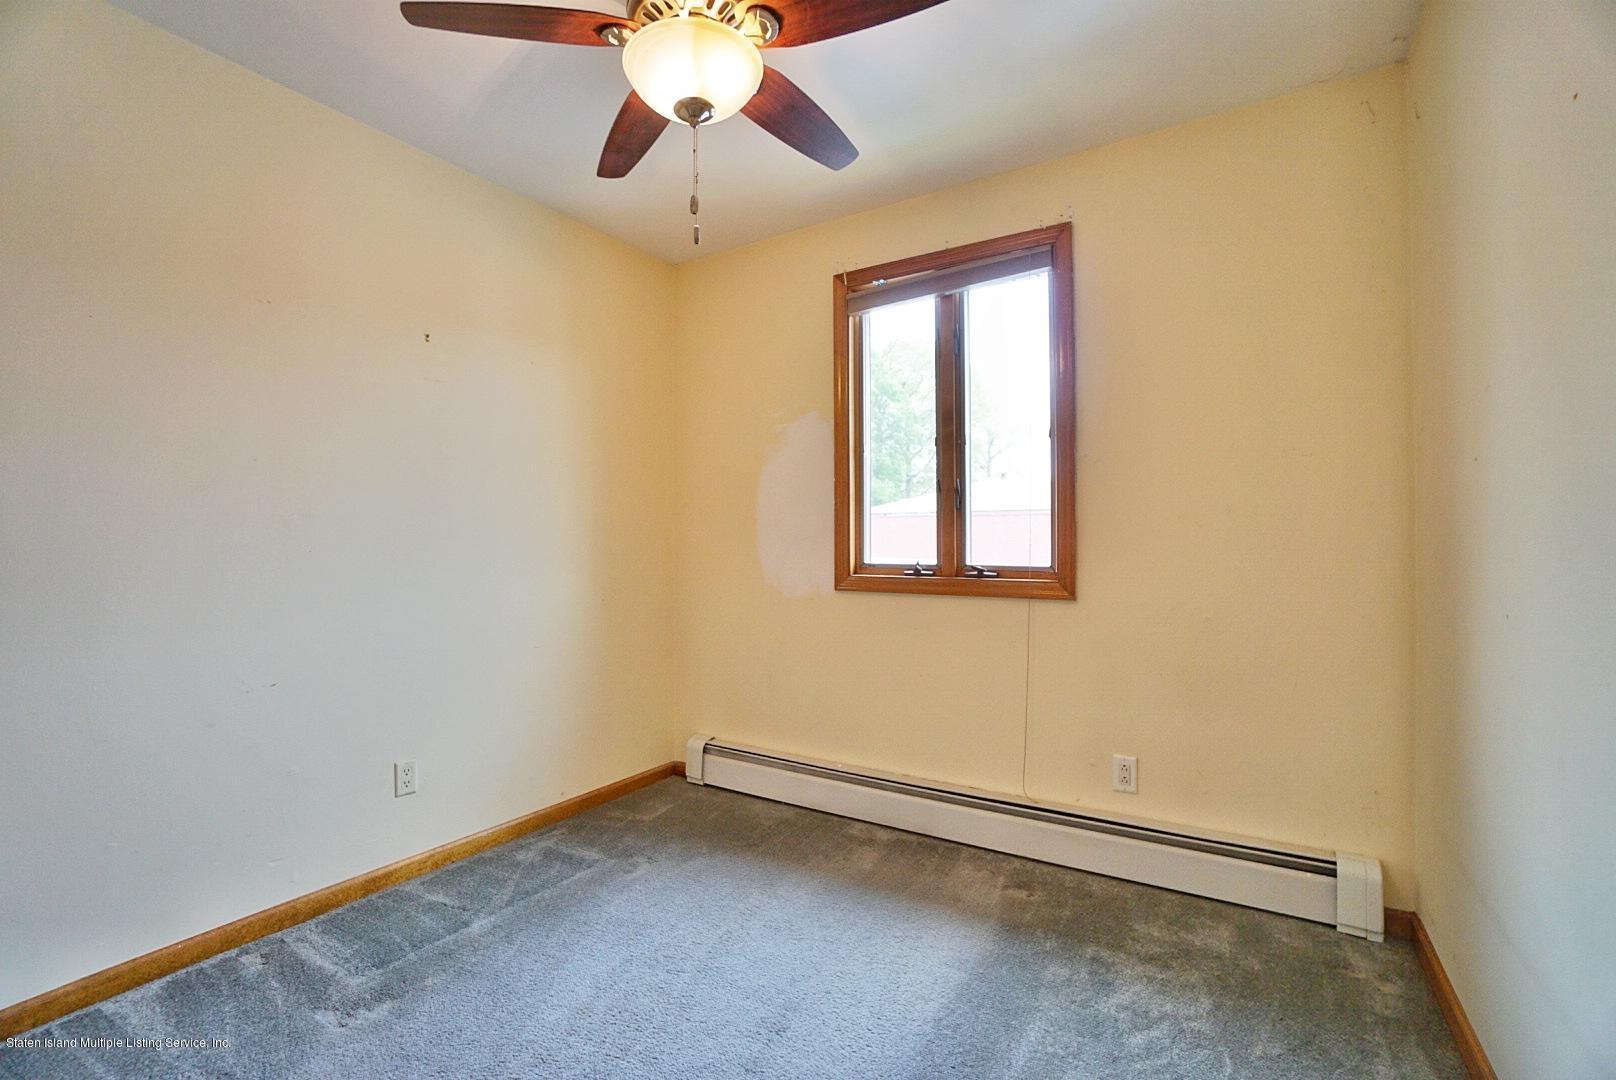 Single Family - Detached 55 Lyndale Avenue  Staten Island, NY 10312, MLS-1128769-17